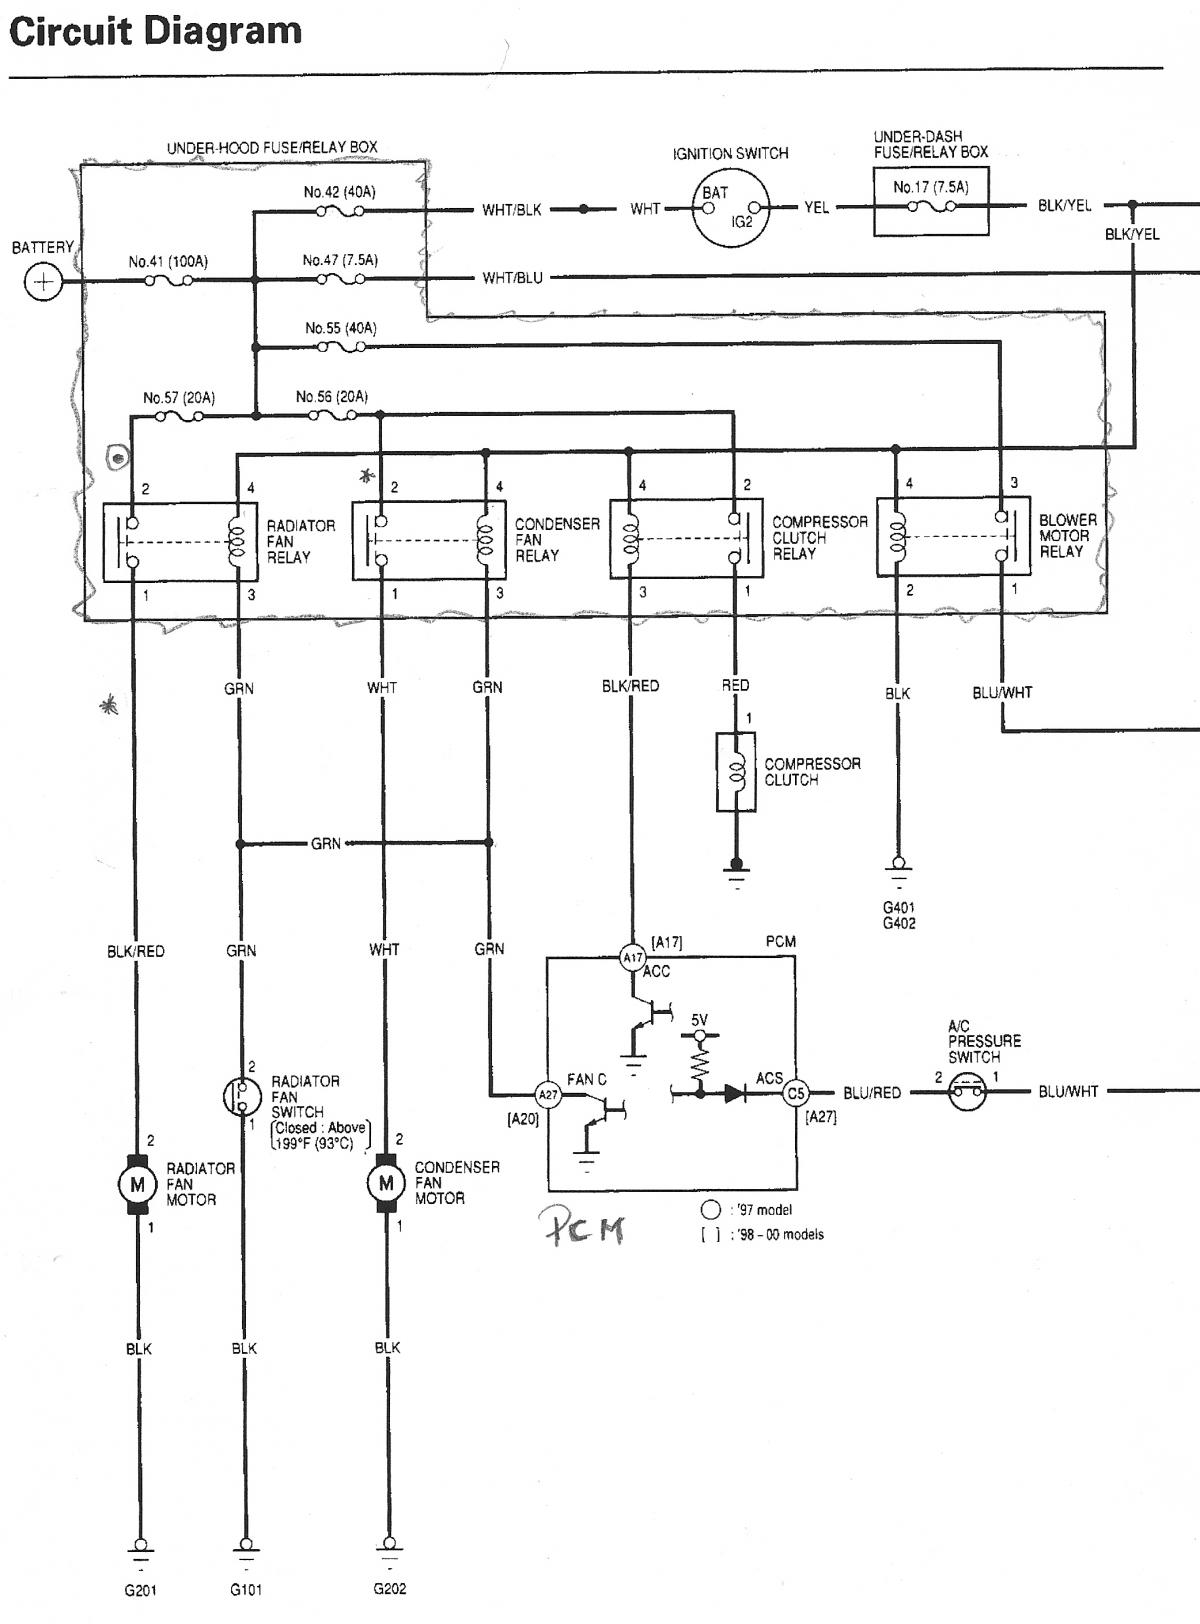 Honda Element Blower Motor Wiring Diagram Detailed Diagrams 93 Del Sol Electrical 2004 Cr V Engine Auto Furnace